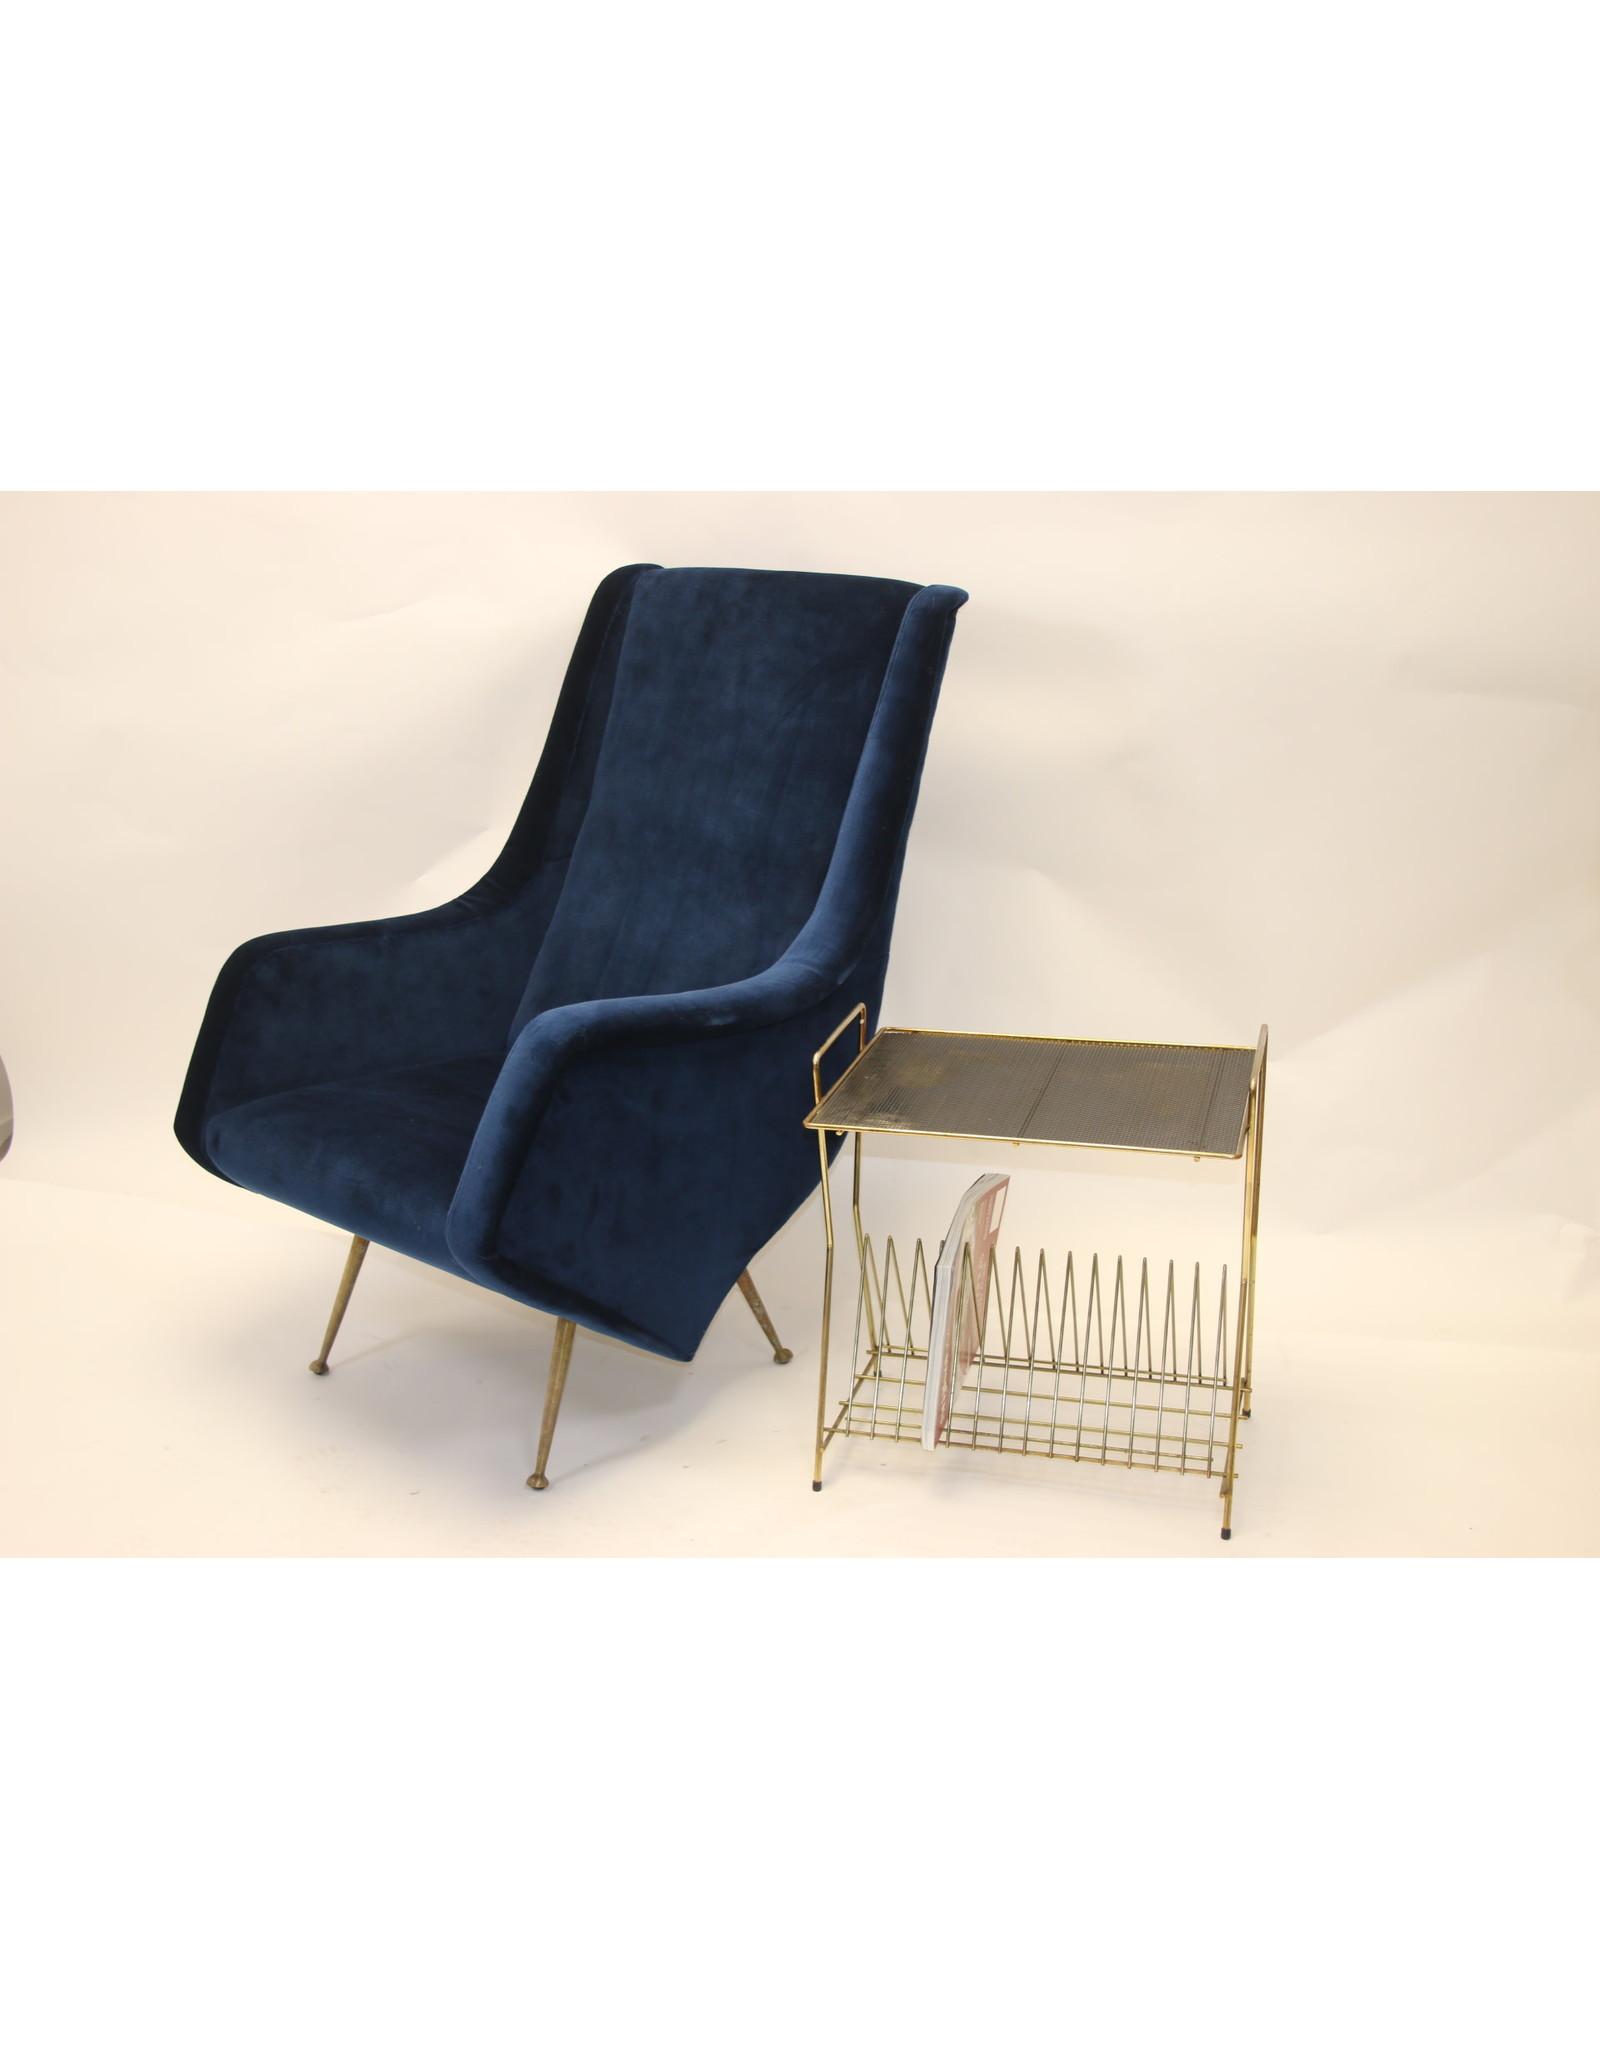 Italiaanse set stoelen Aldo Morbelli van ISA Bergamo, 1950s